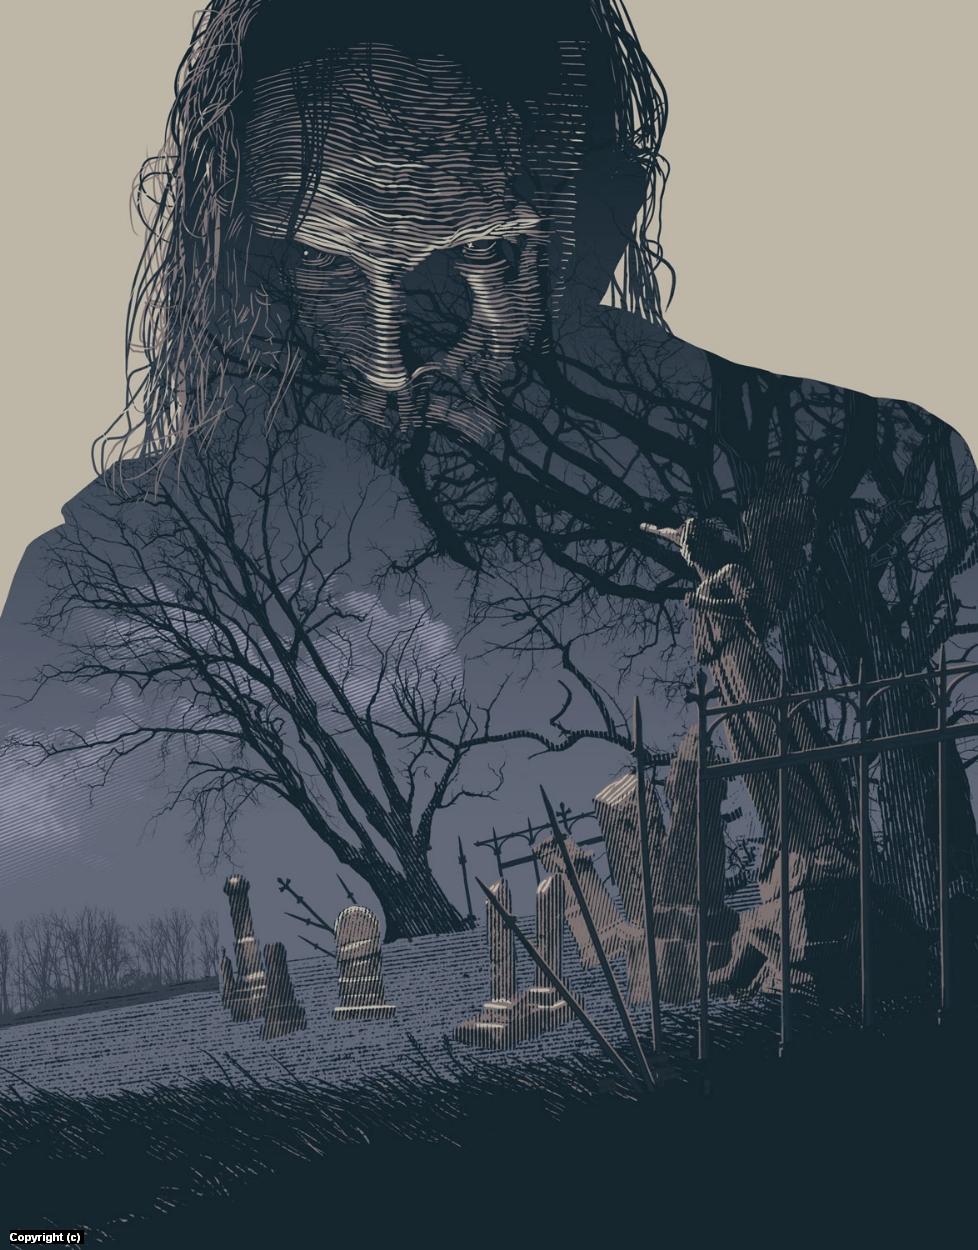 Frankenstein Artwork by Douglas Bell